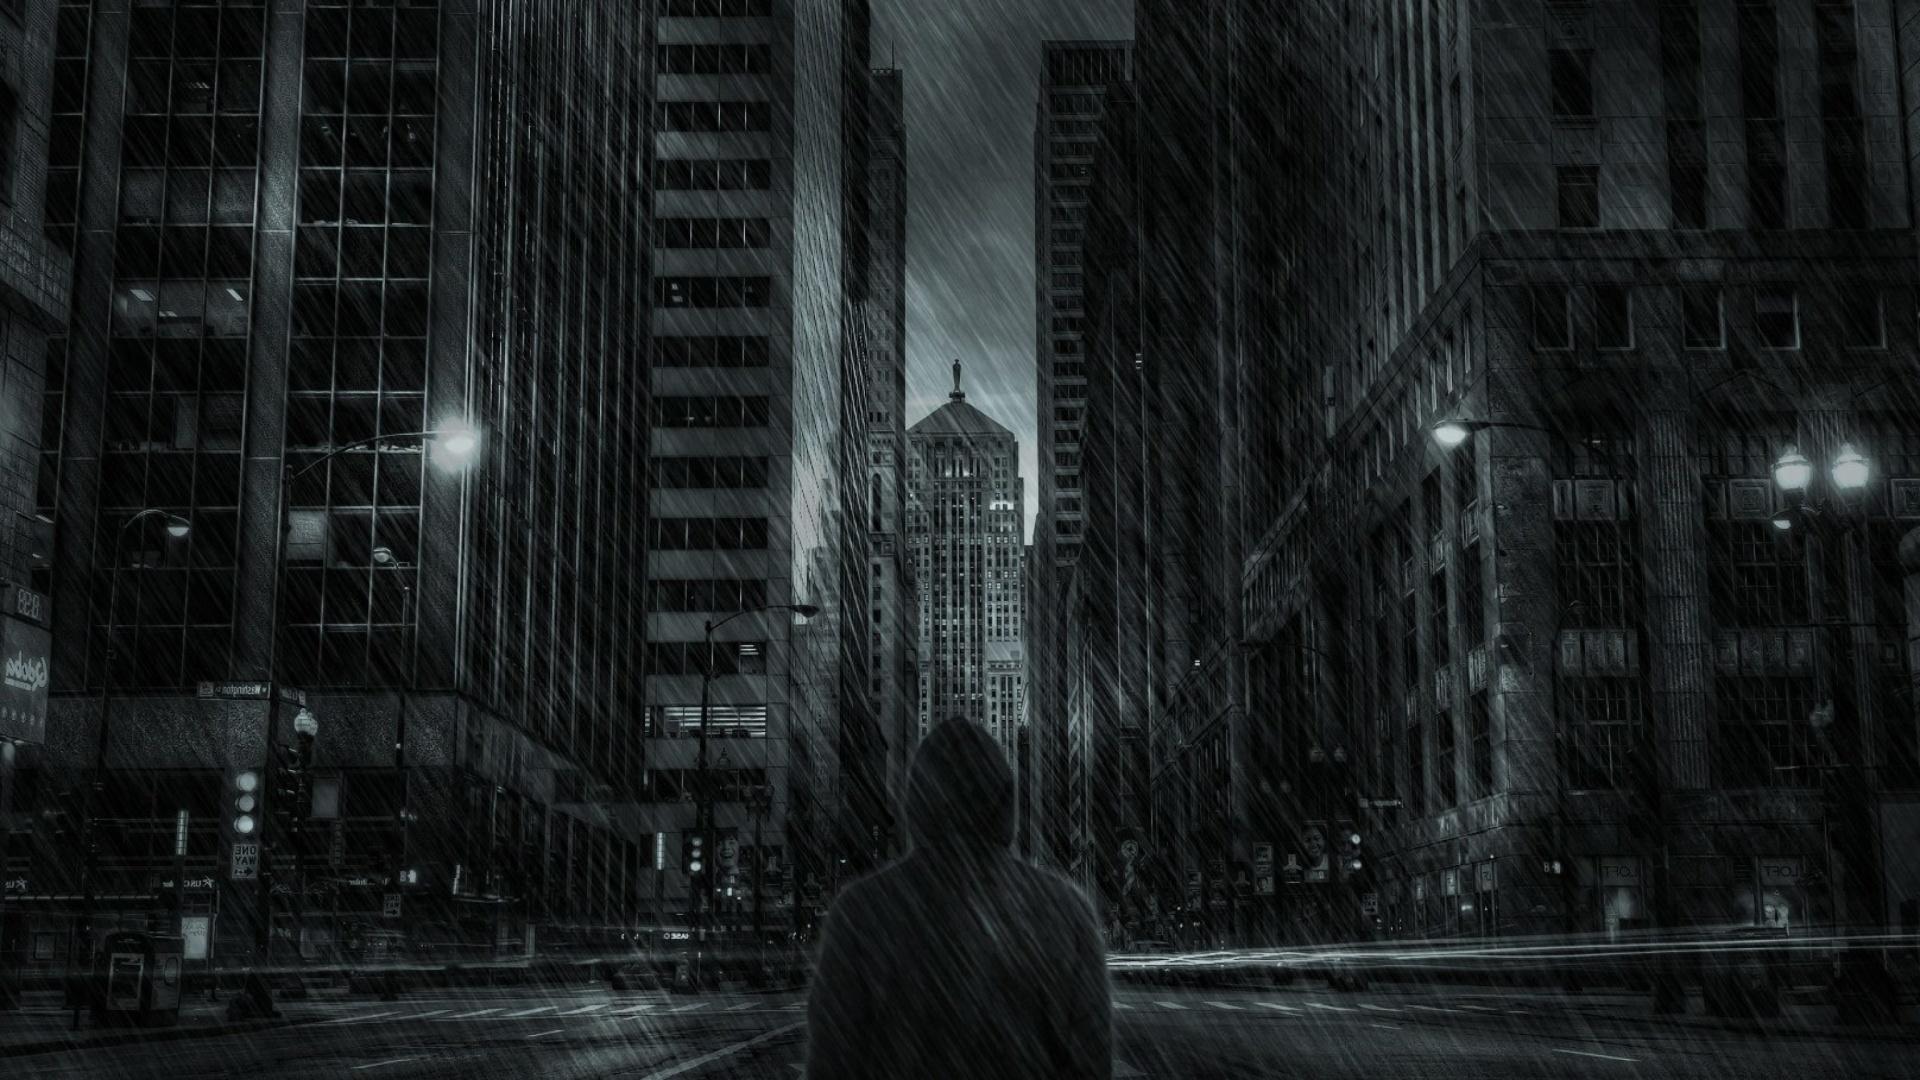 Dark City HD Wallpaper for Desktop 1920x1080 Full HD